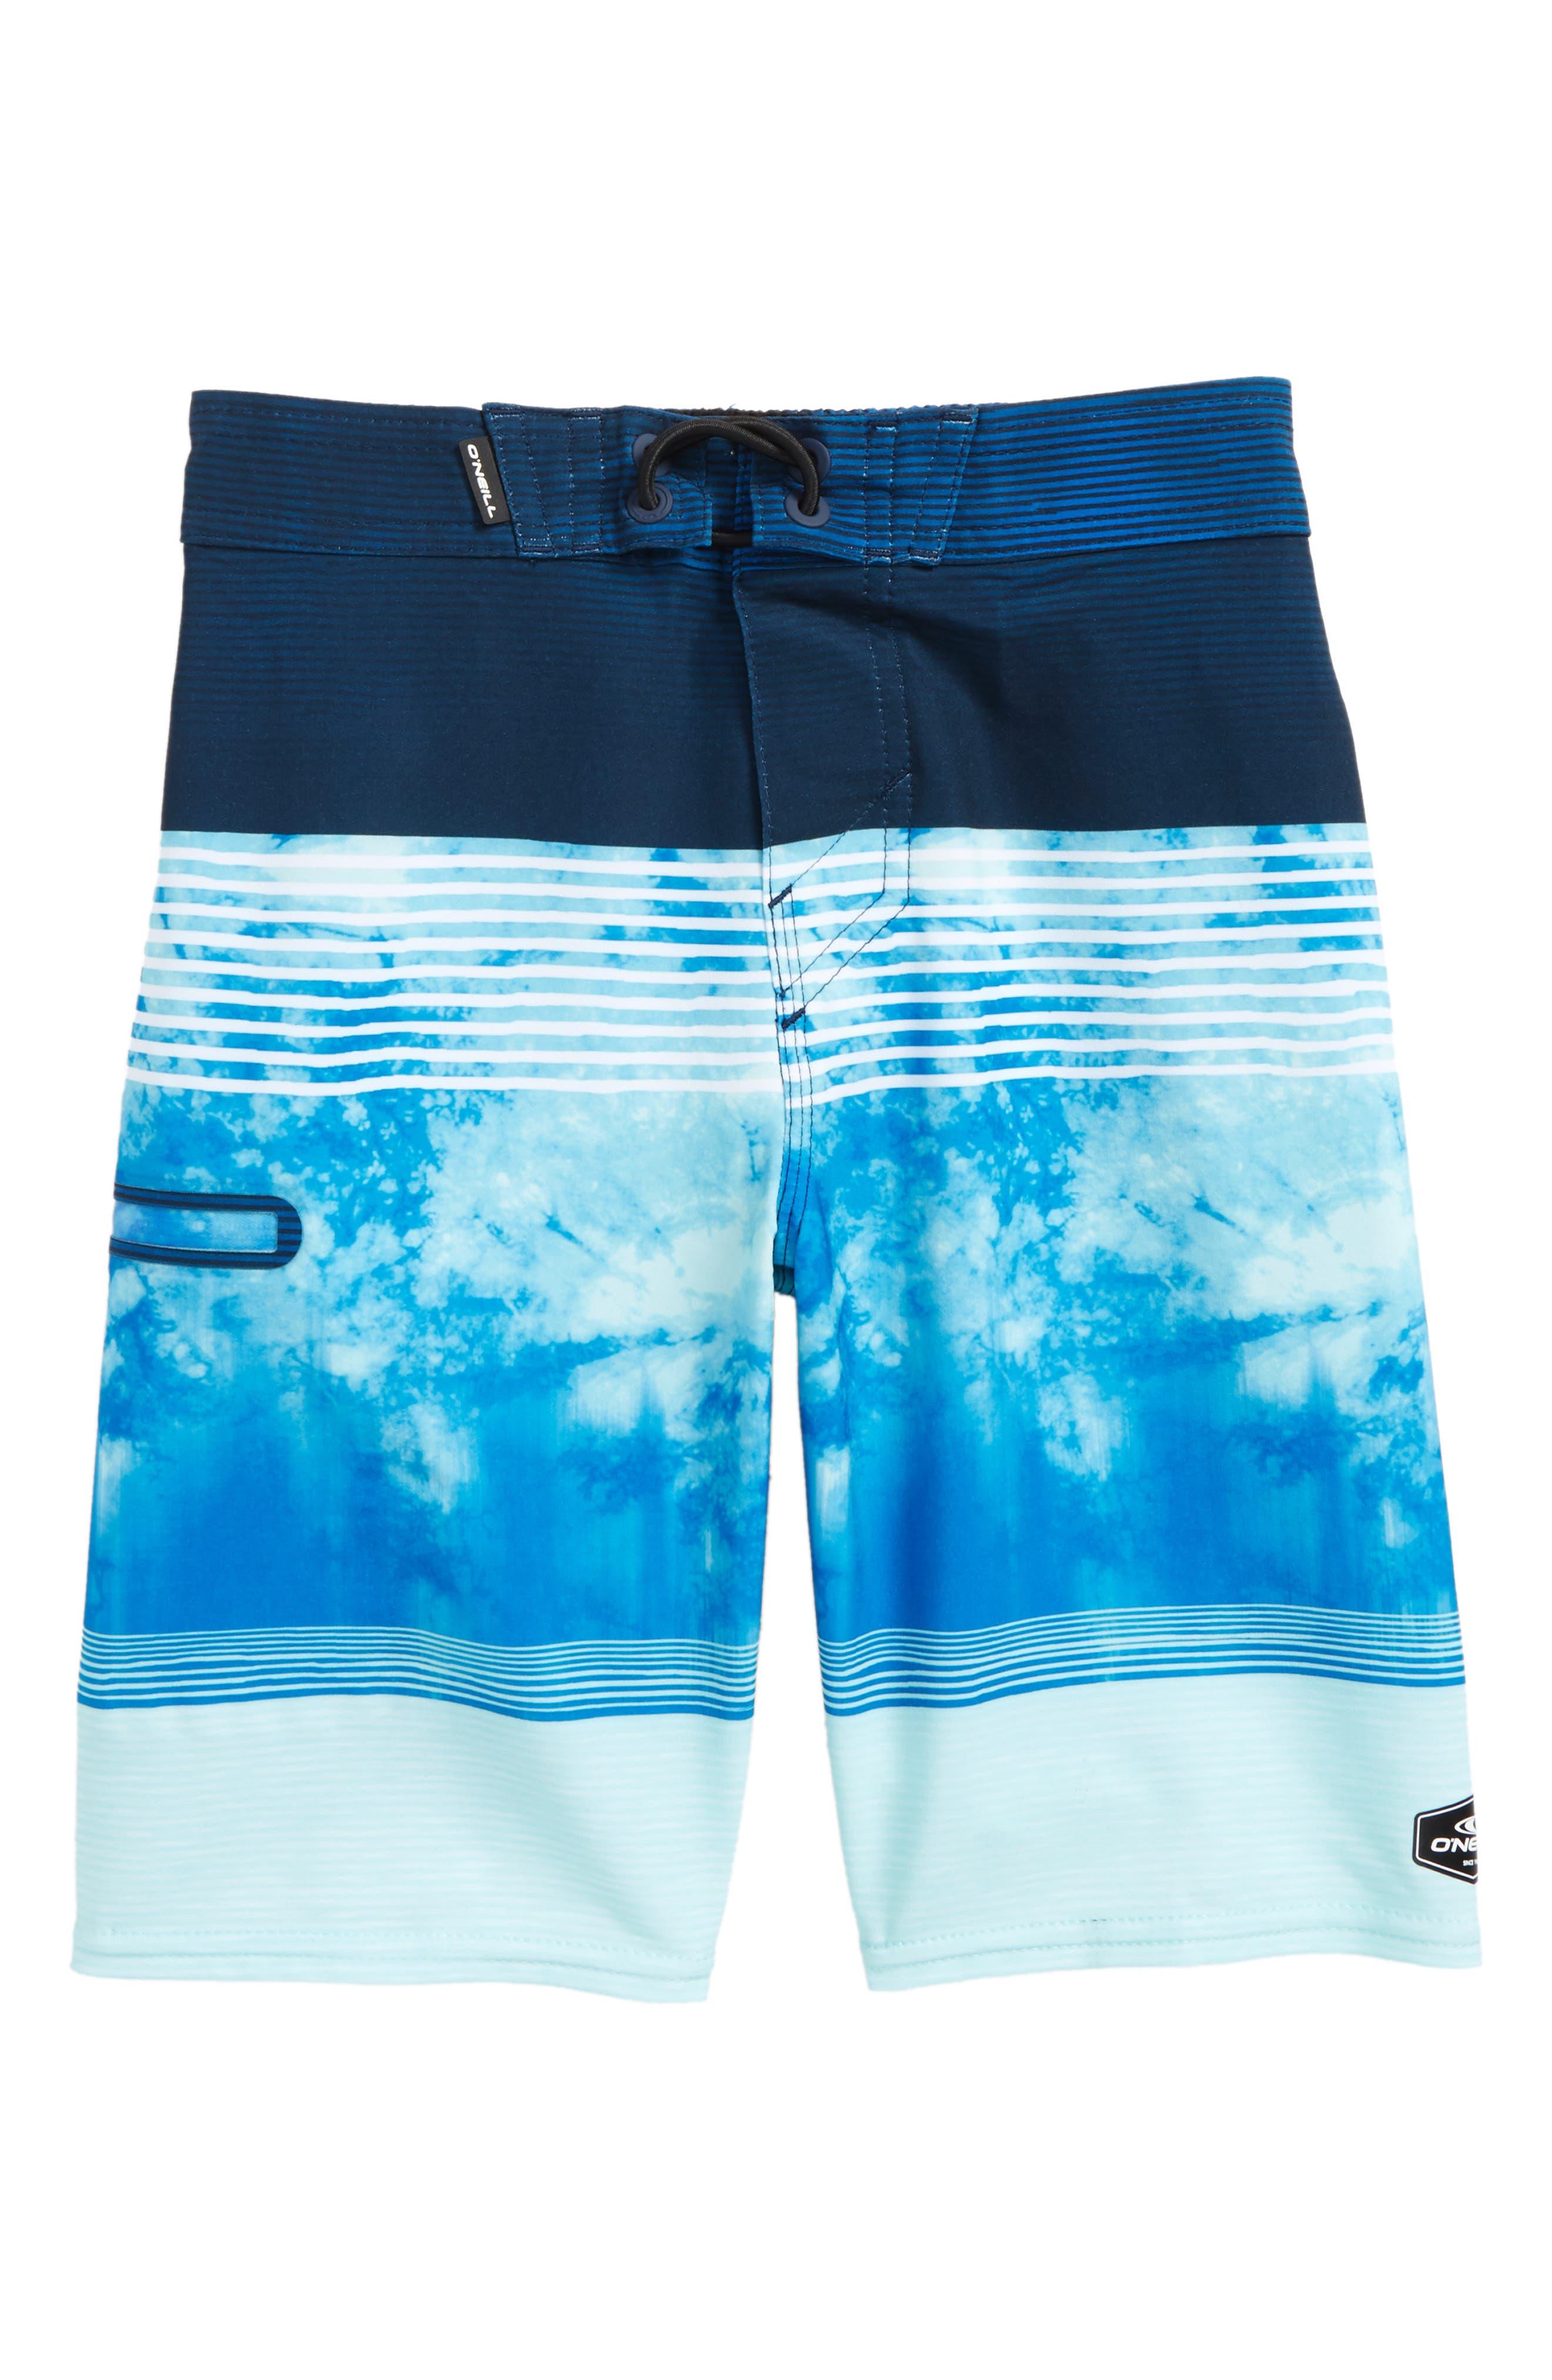 Hyperfreak Board Shorts,                             Main thumbnail 1, color,                             400